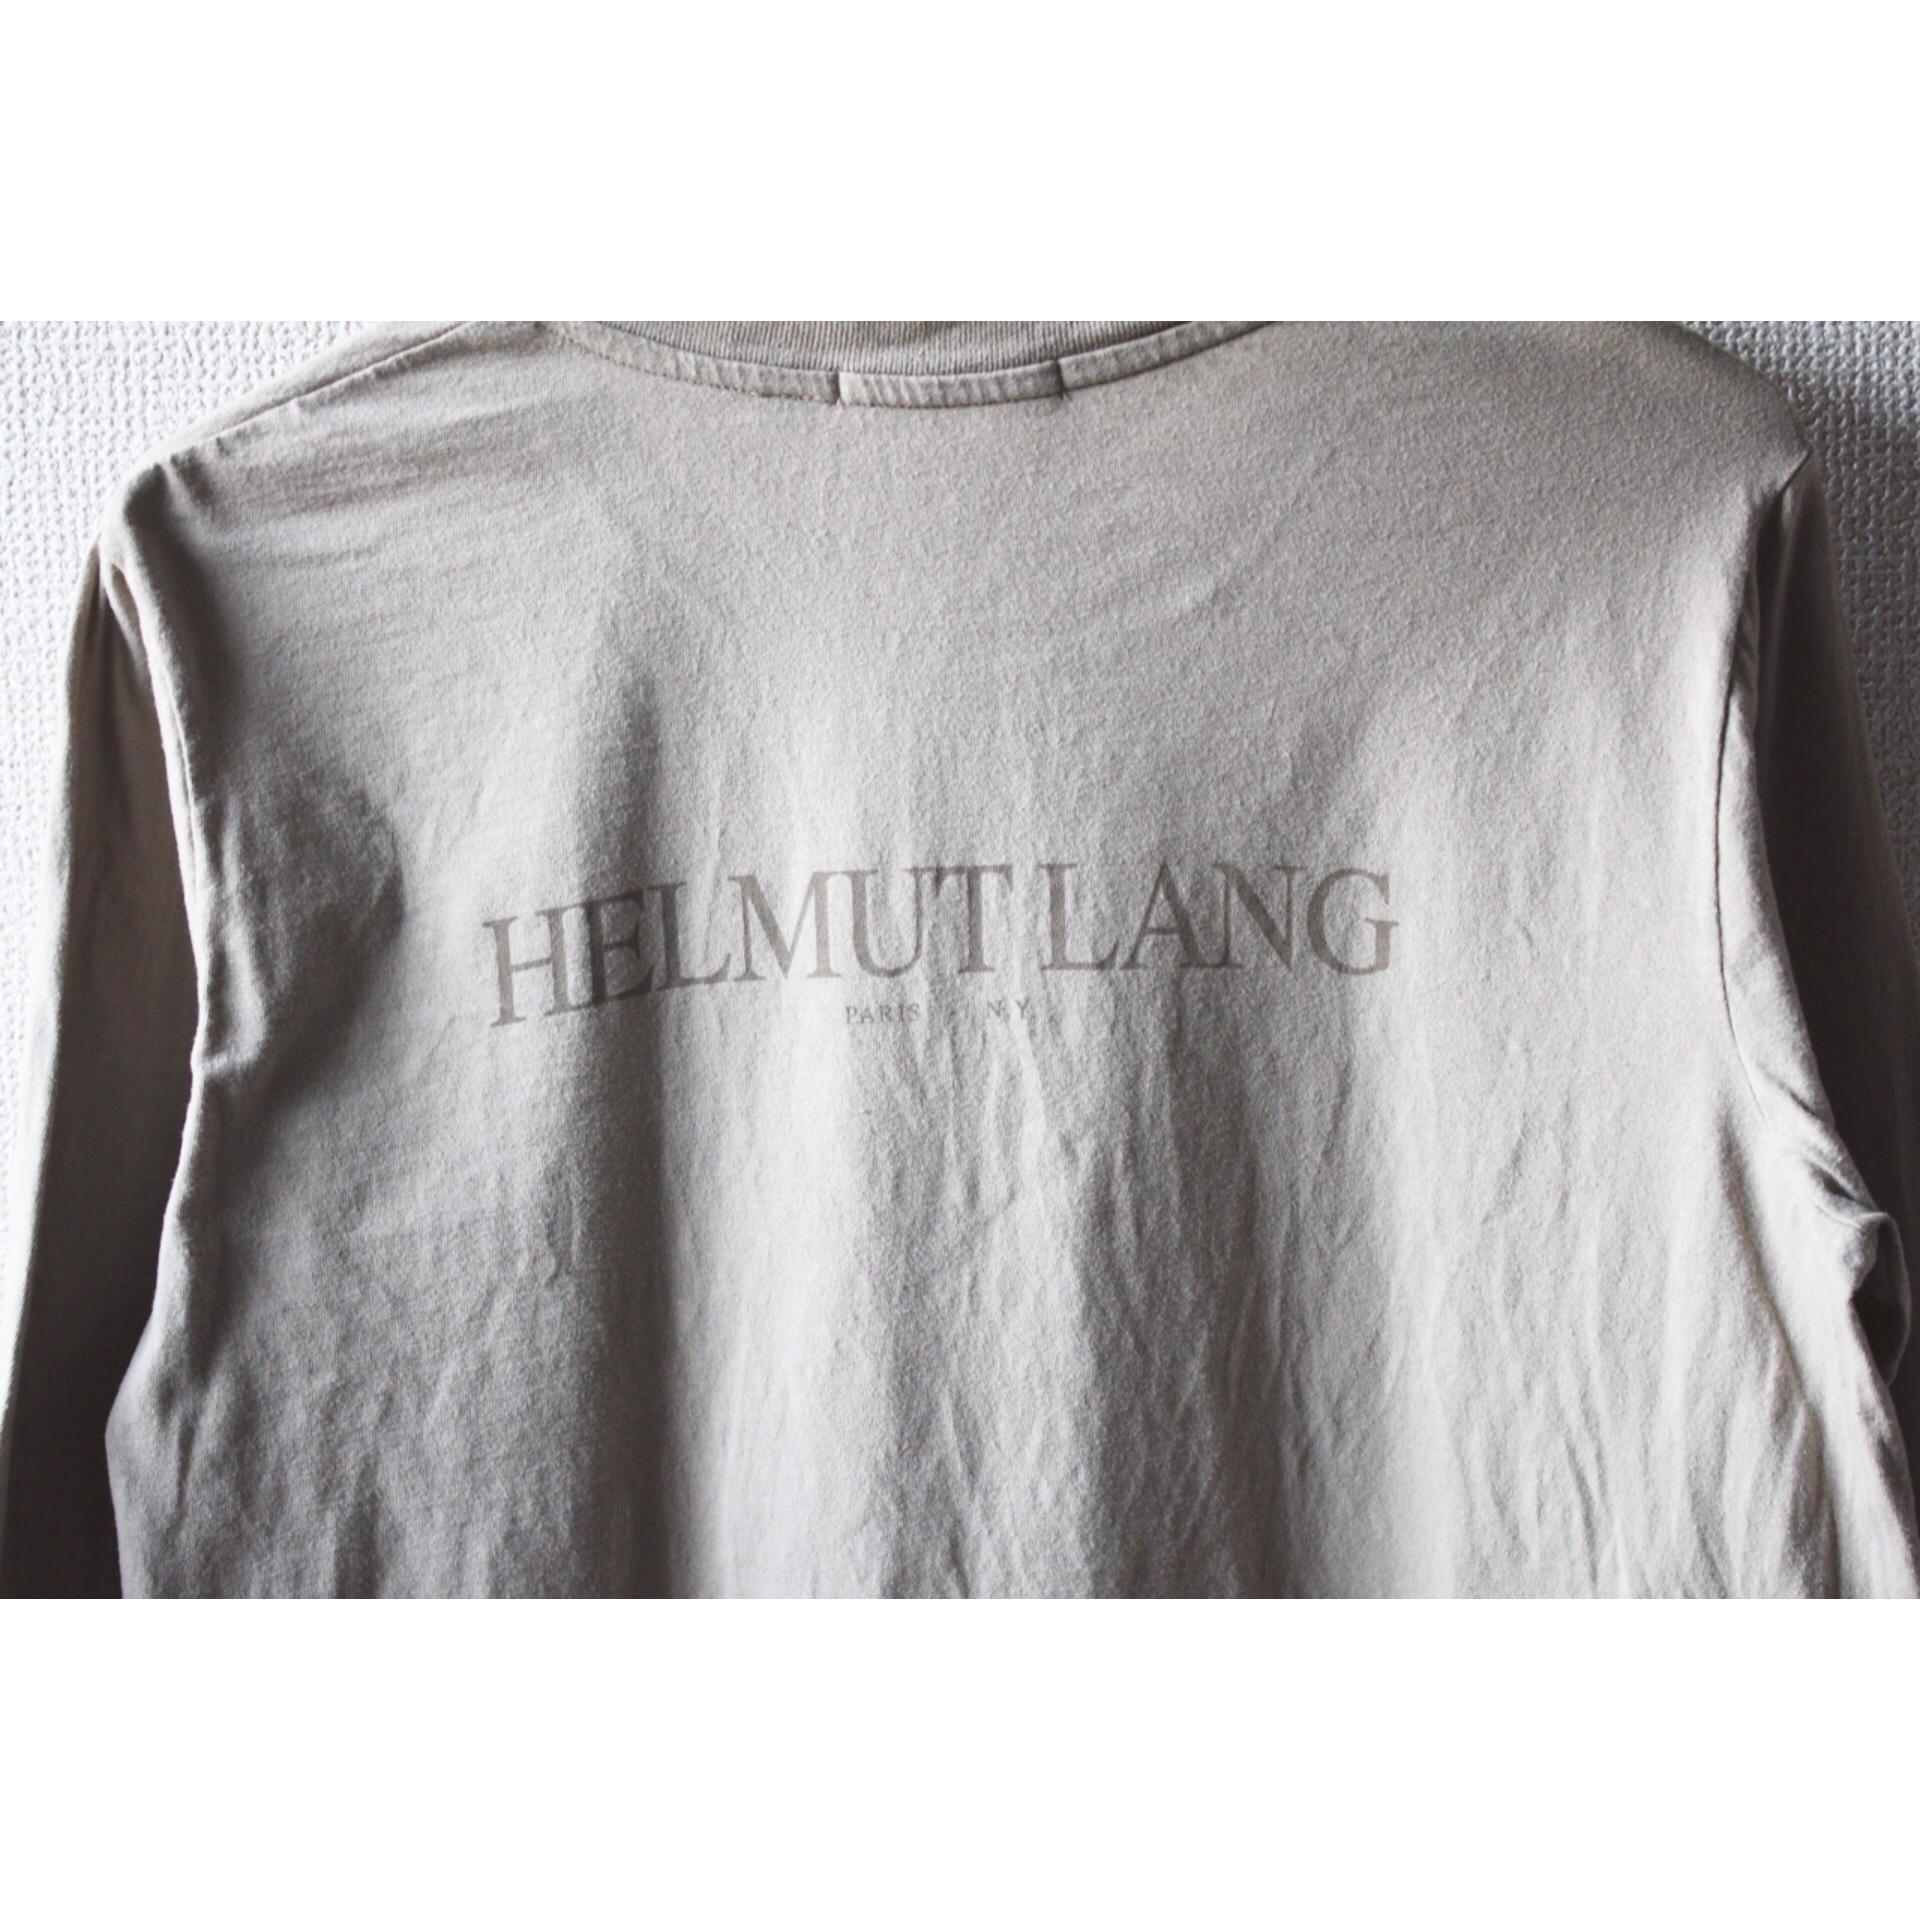 Long sleeve shirt by Helmut Lang